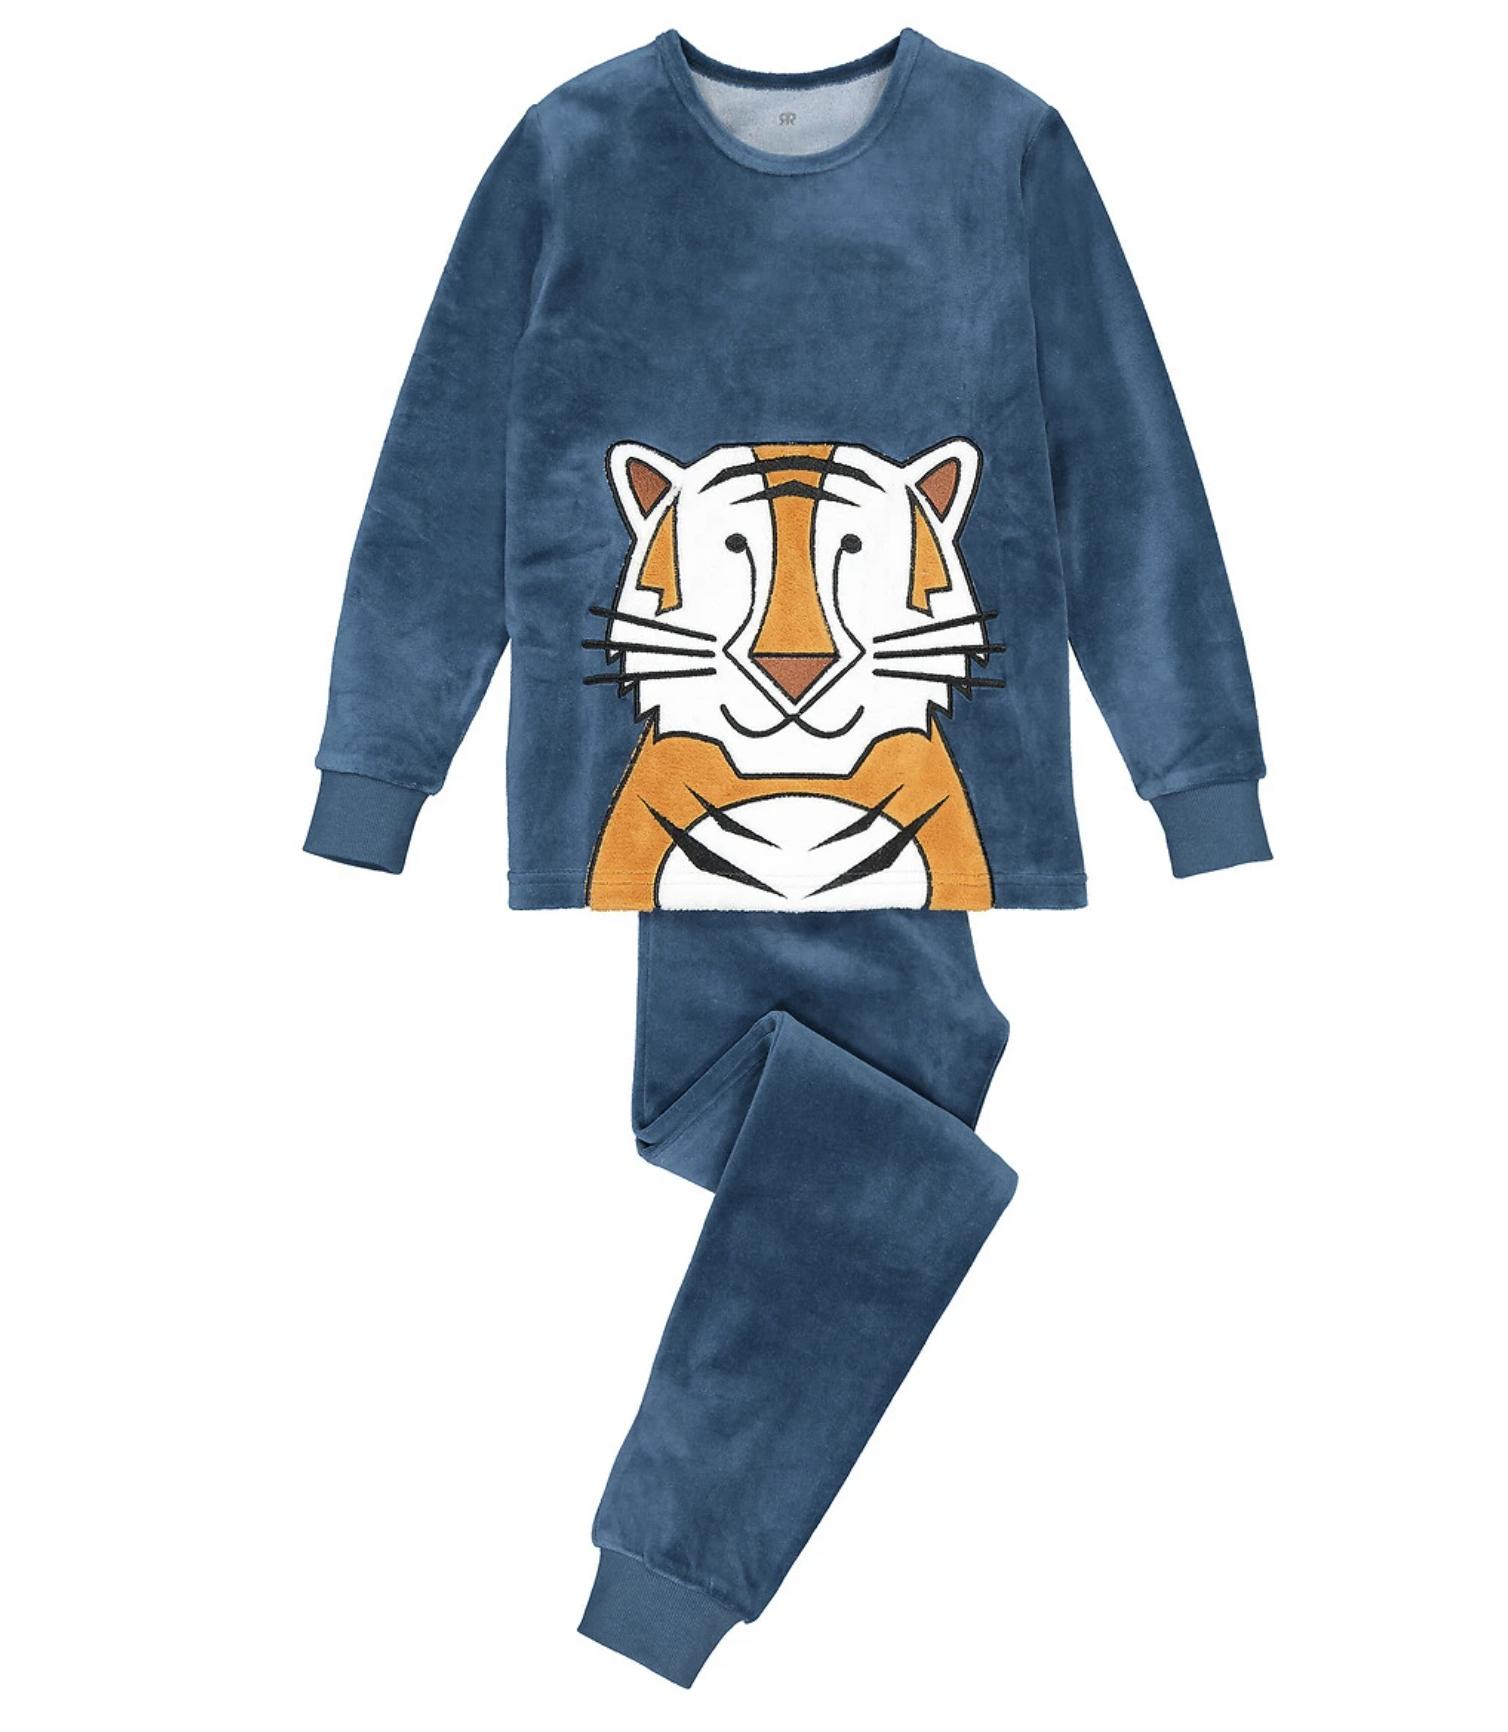 Pijama de terciopelo con motivo de tigre